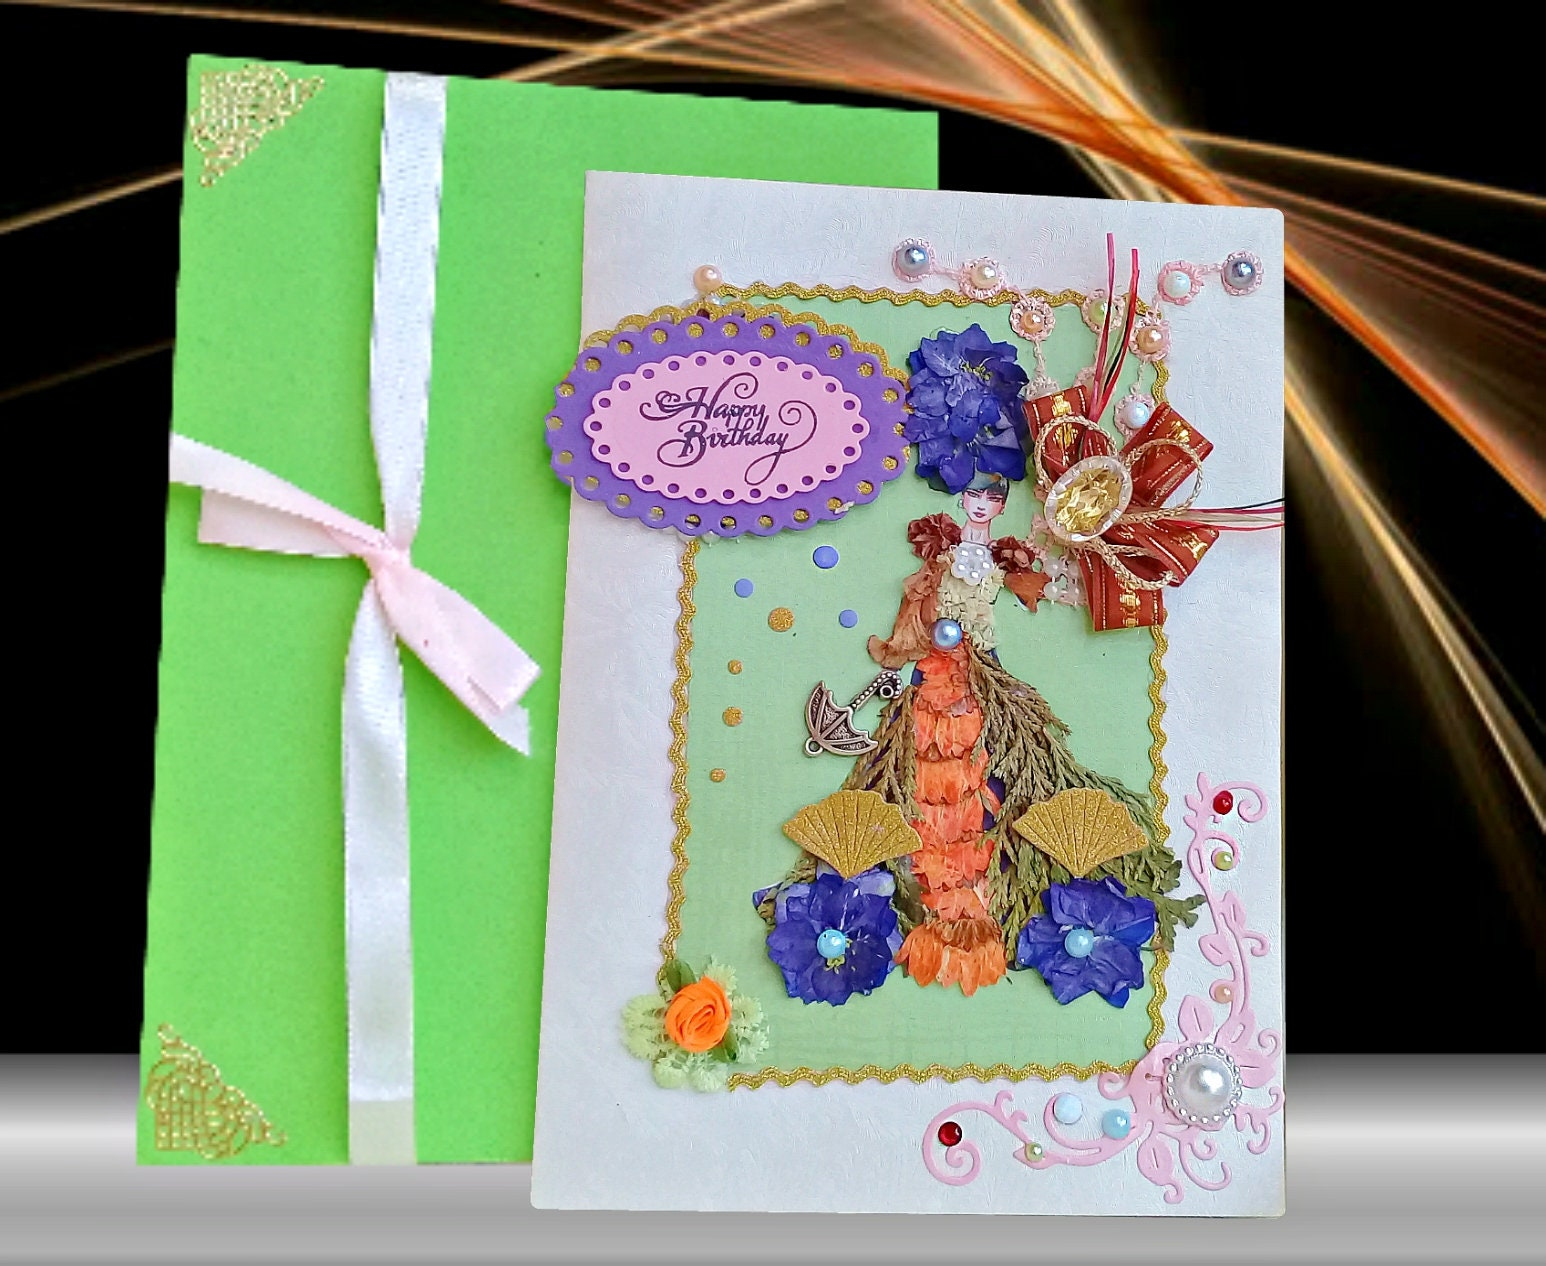 Flower Girl Cards Girlfriend Birthday 21 Card For